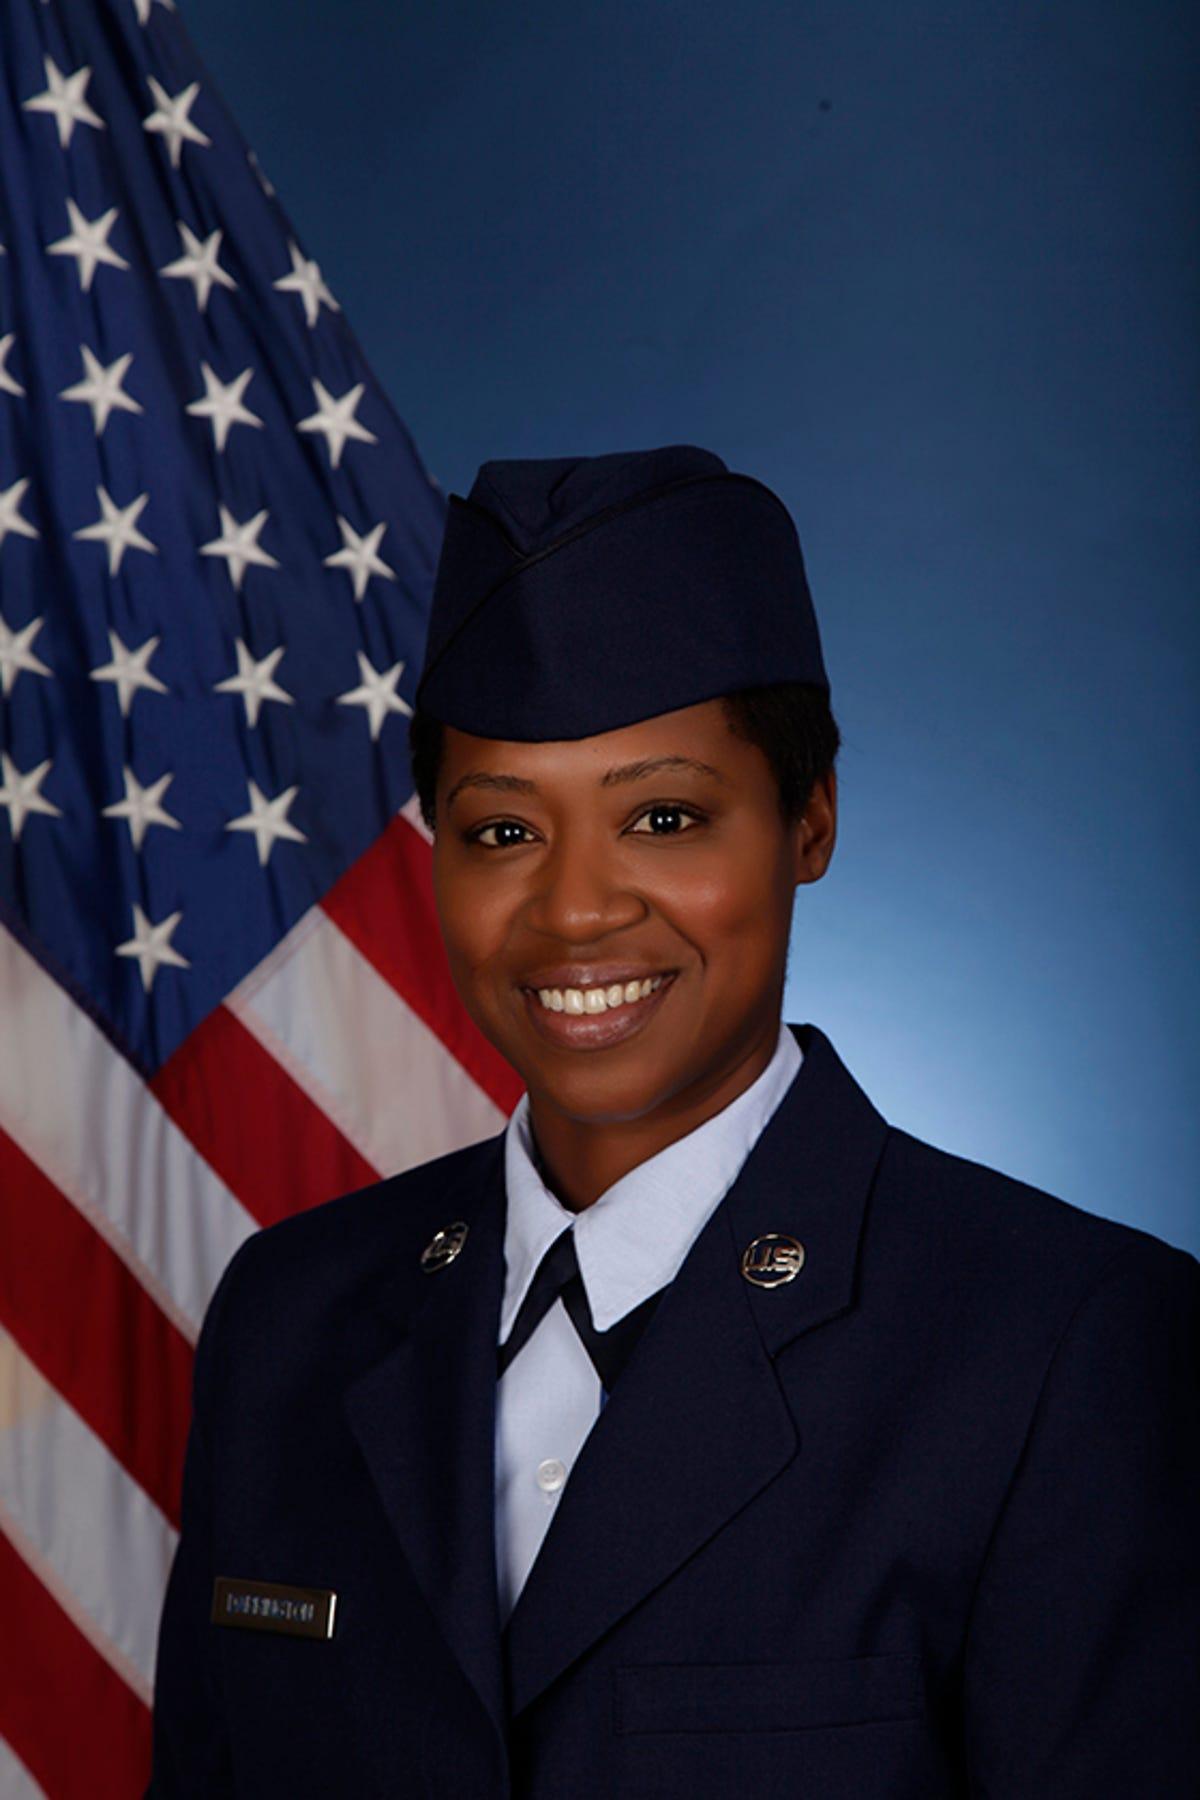 Jeff Davis graduate completes Air Force basic training